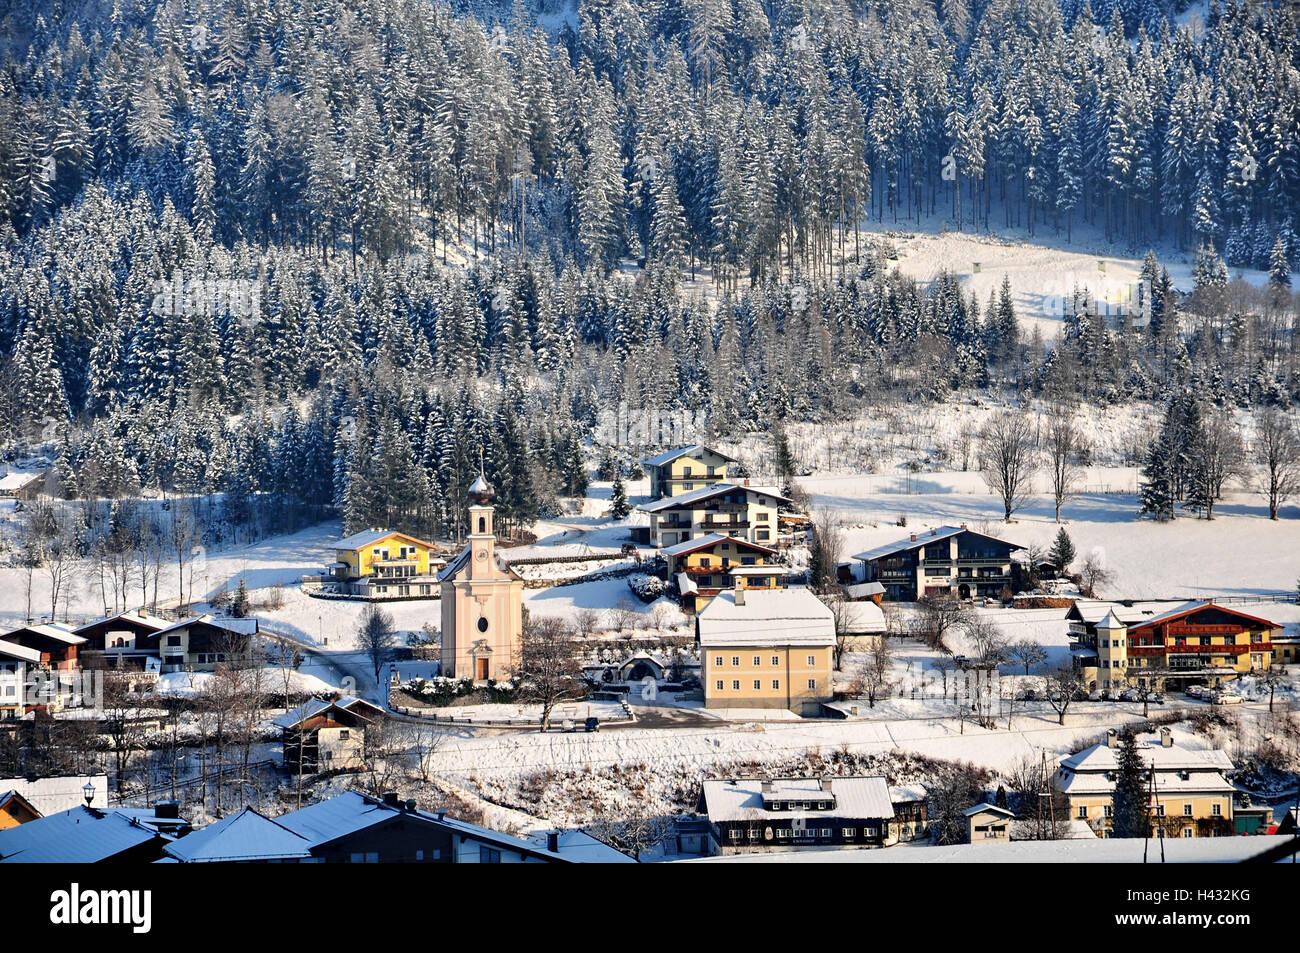 Austria Salzburg Country Flachau Town View Winter Stock Photo Alamy